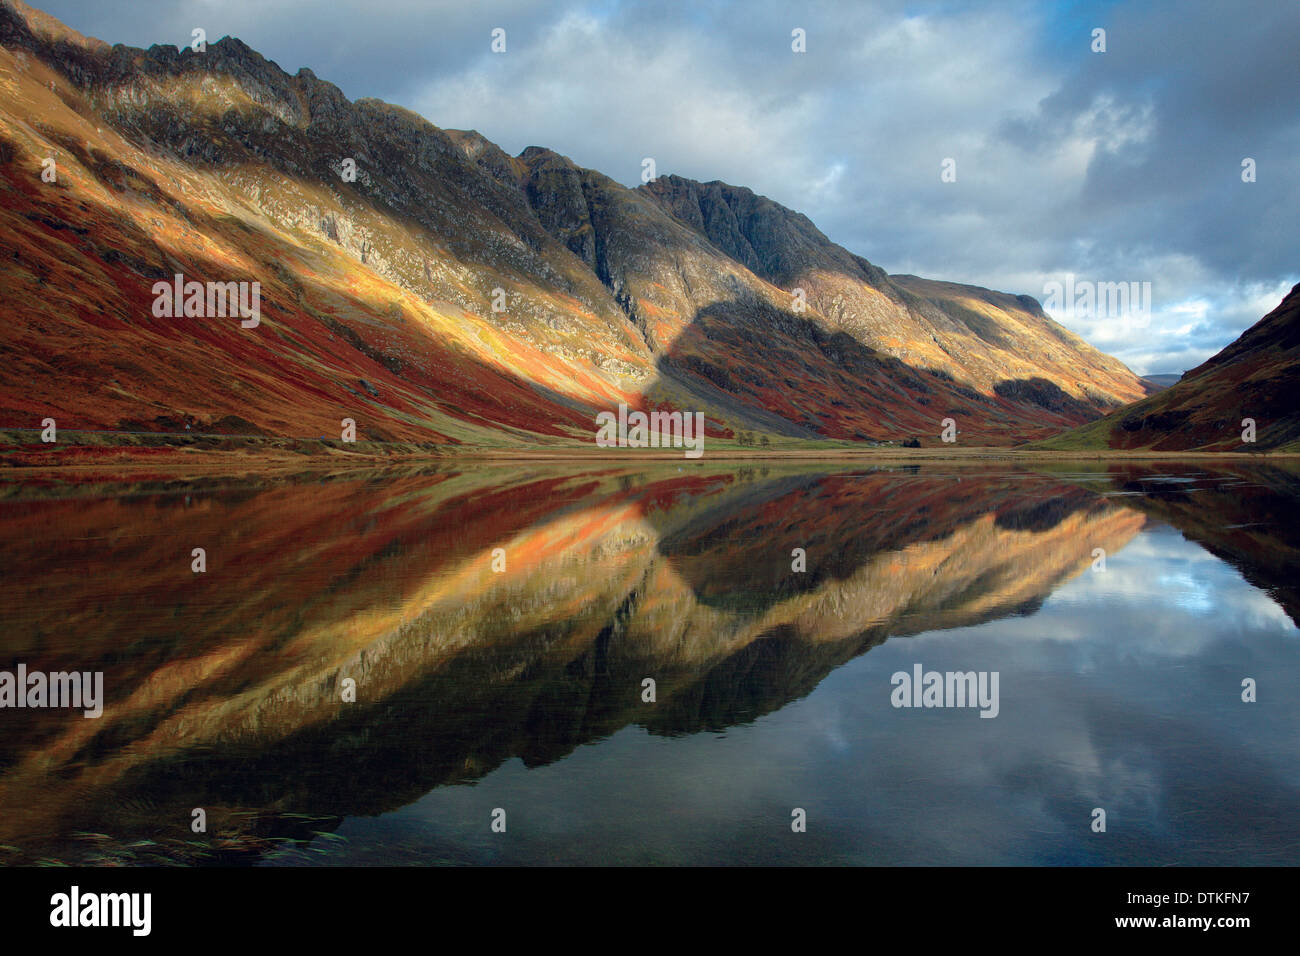 Loch Achtriochtan and the Aonach Eagach, Glencoe, Highland - Stock Image